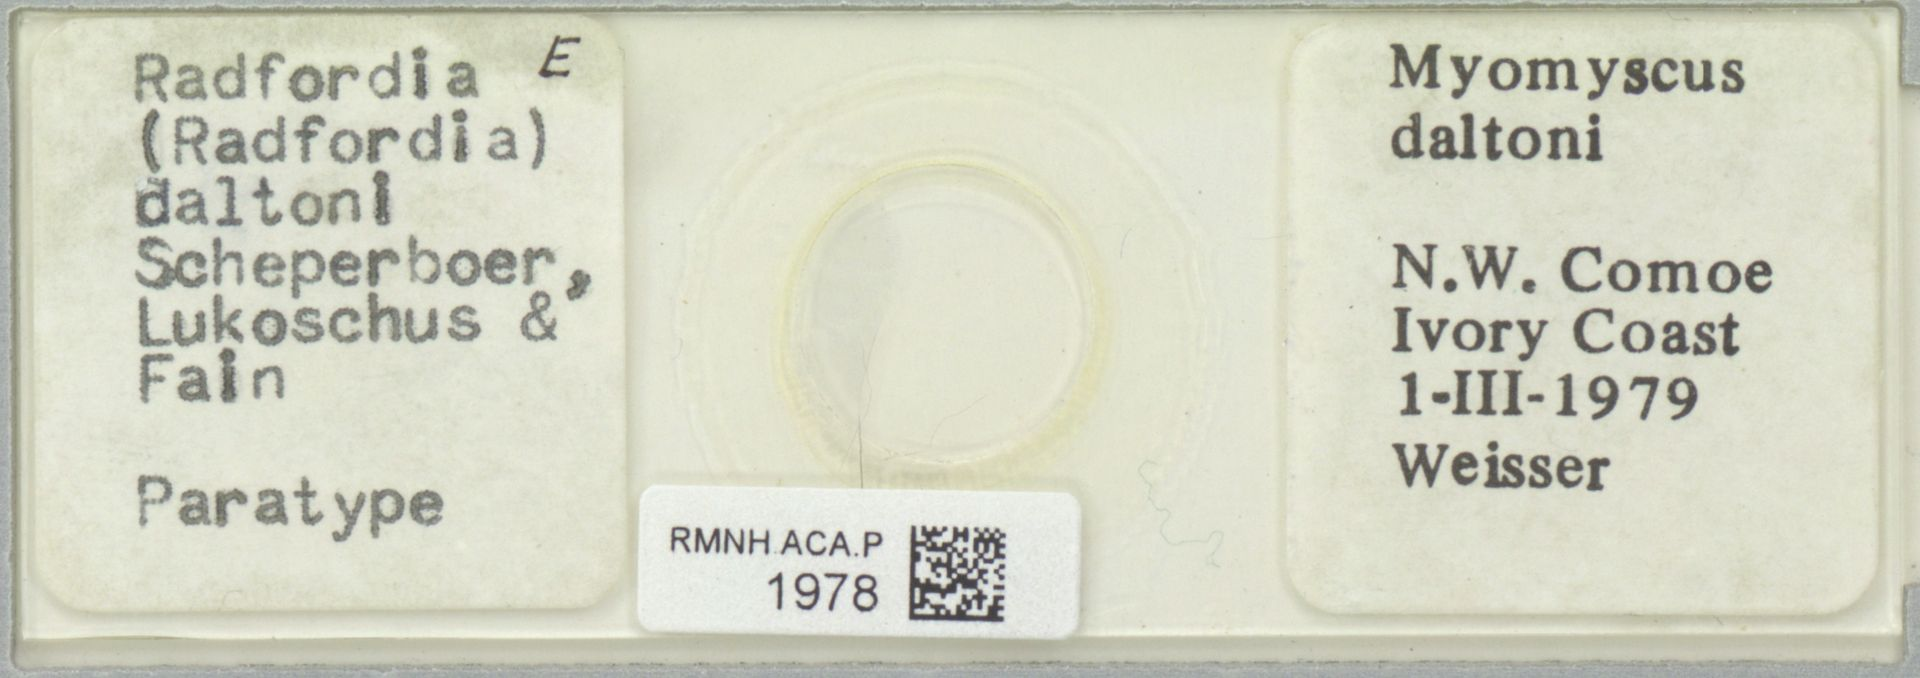 RMNH.ACA.P.1978   Radfordia (Radfordia) daltoni Scherperboer, Lukoschus & Fain